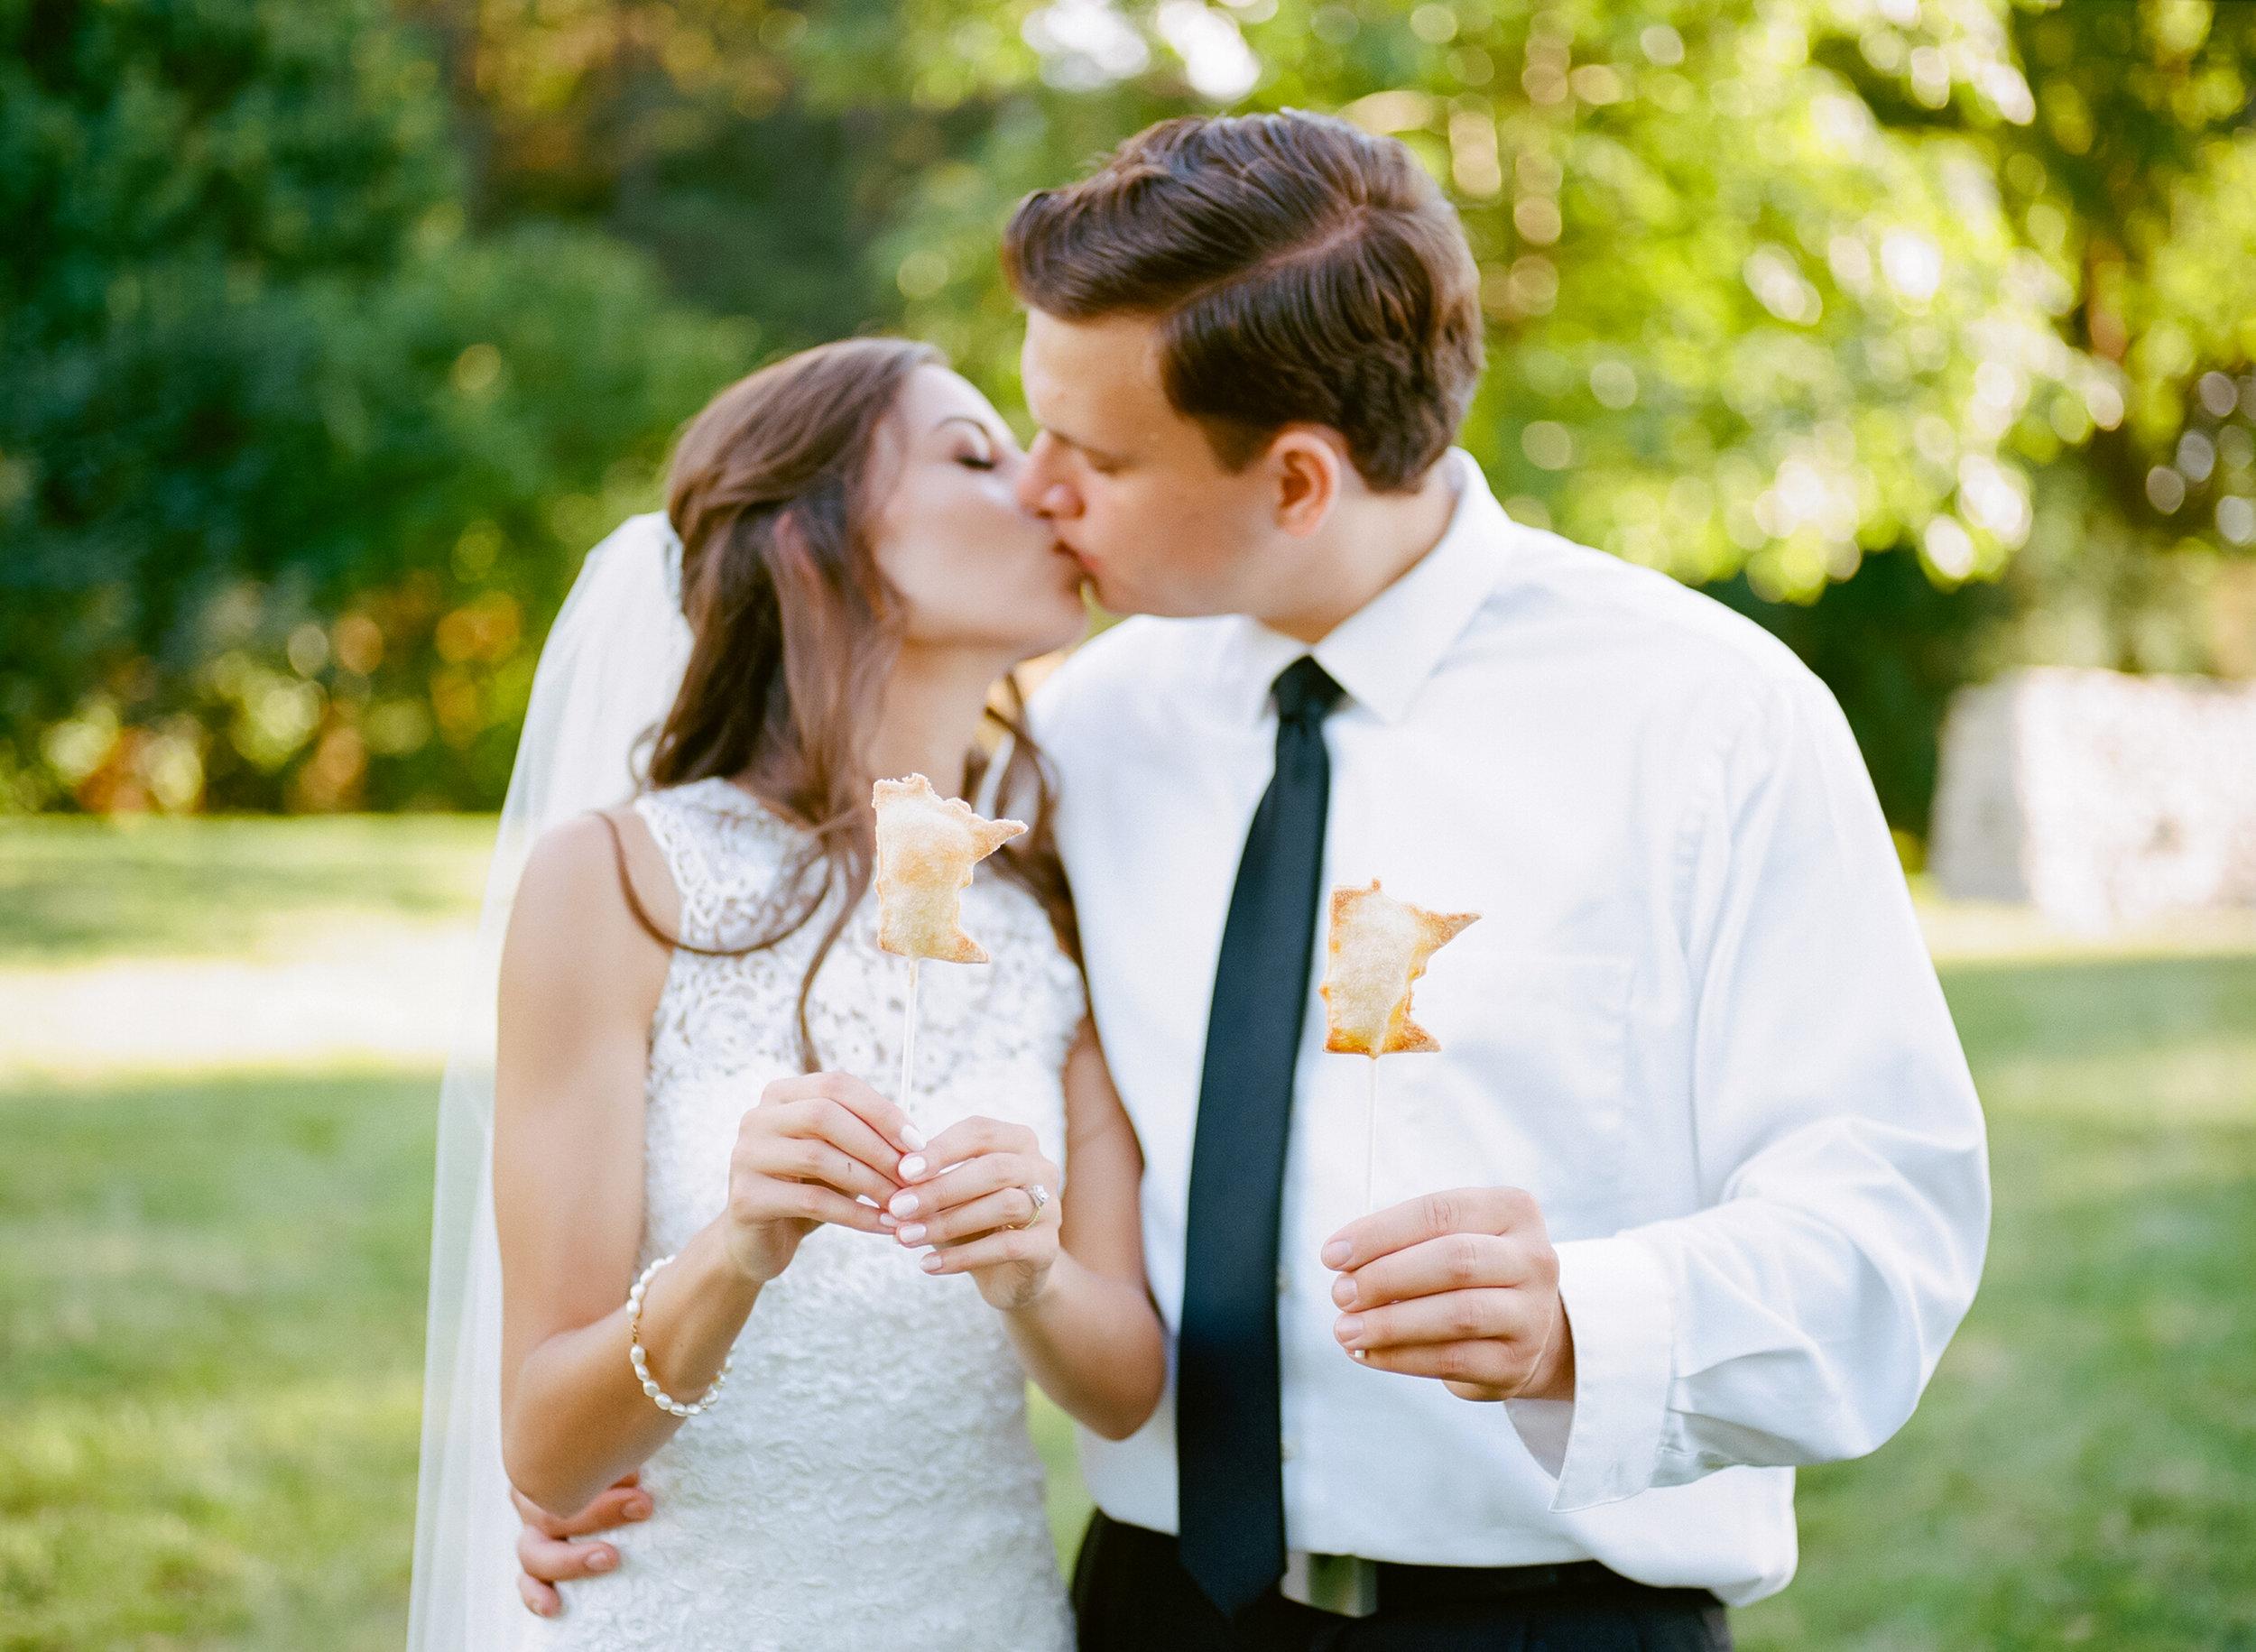 Minnesota pie pops at summer garden wedding